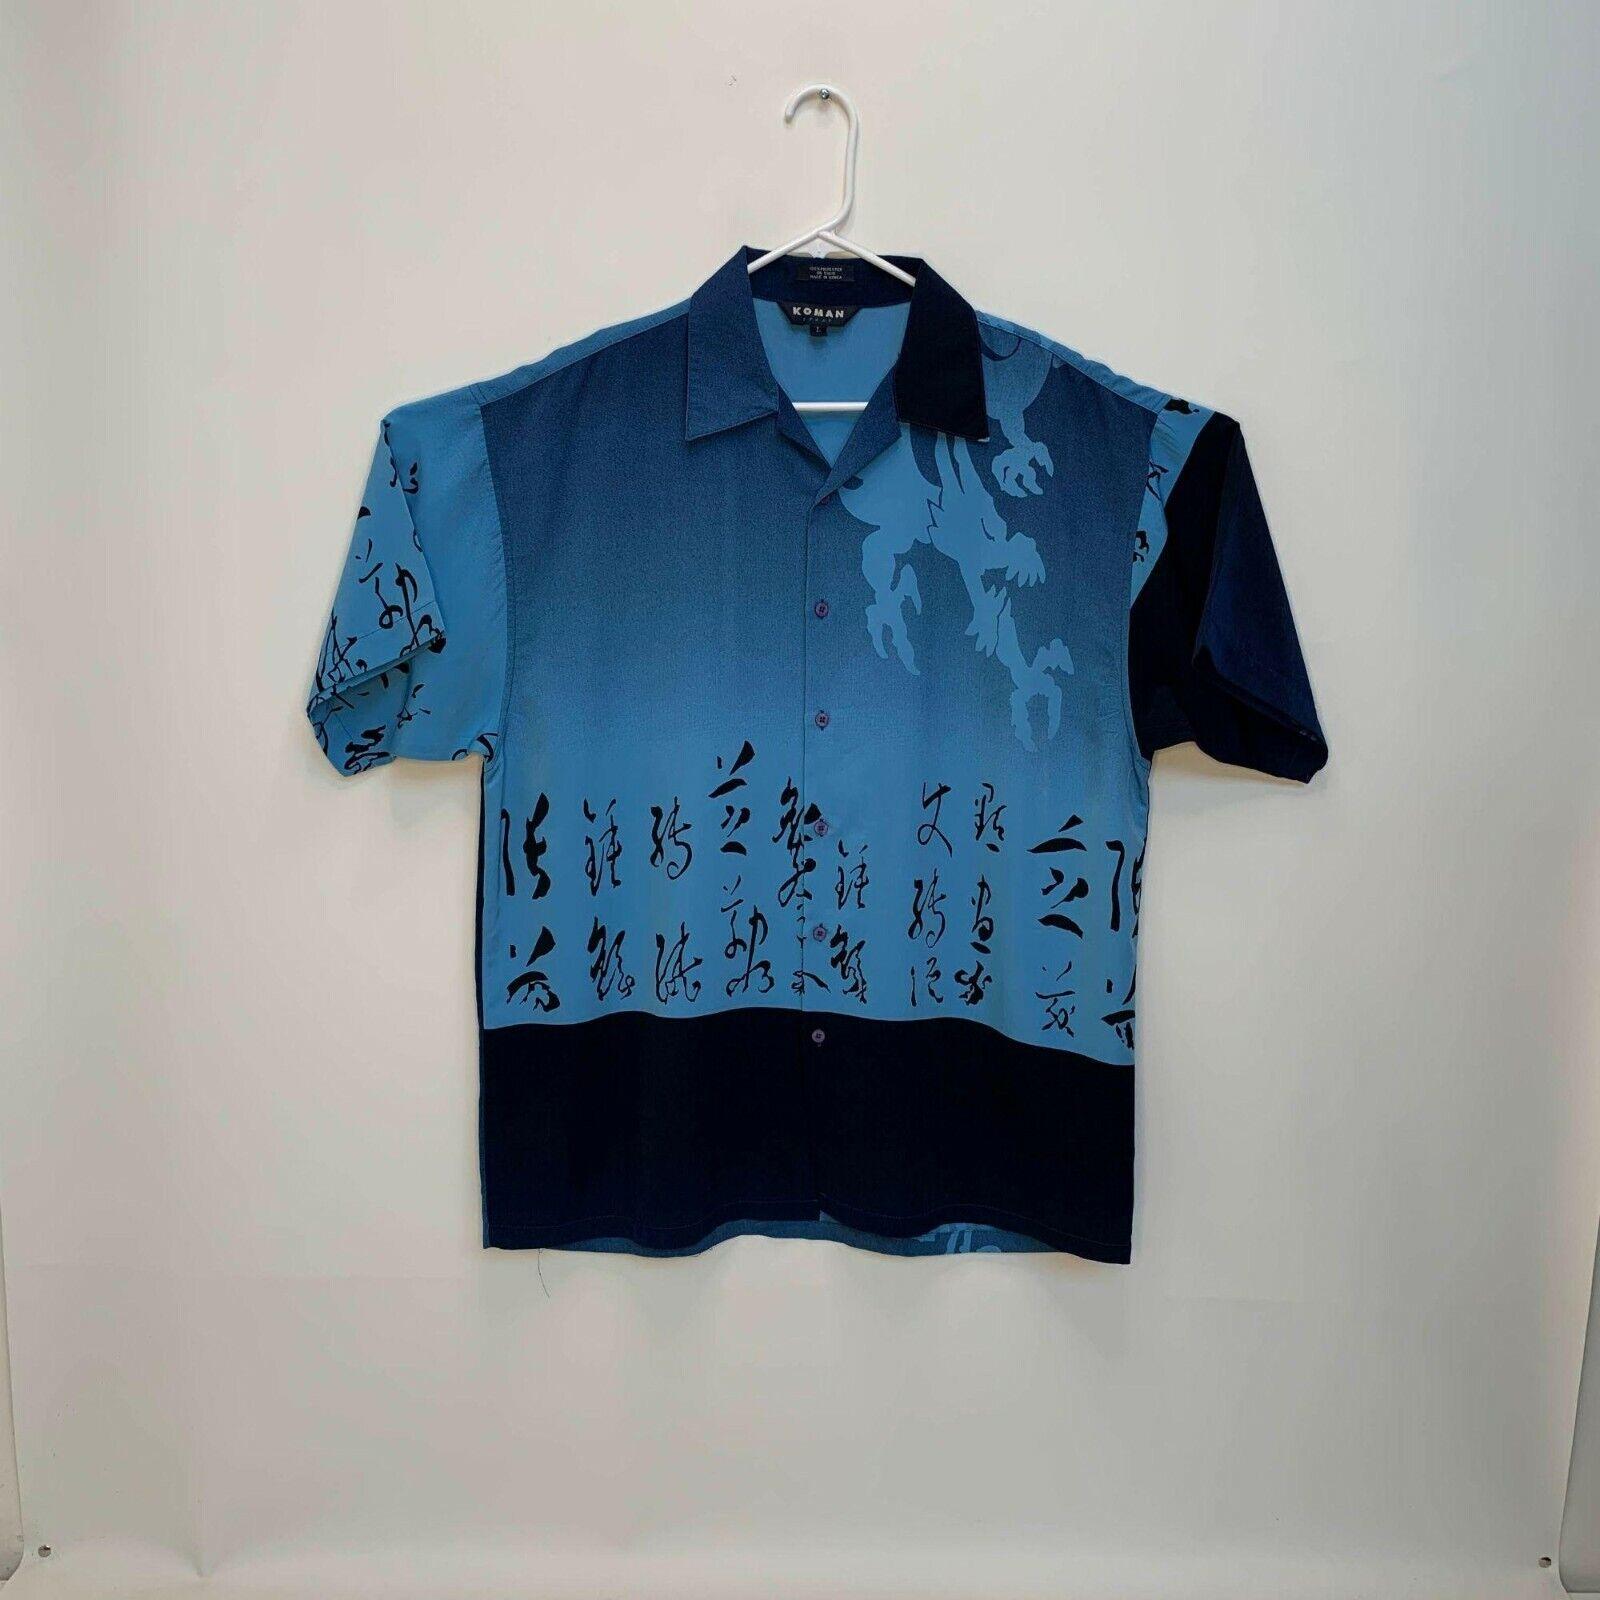 Koman Sport Mens Dragon Print Shirt Blue Large Gem [ 1600 x 1600 Pixel ]